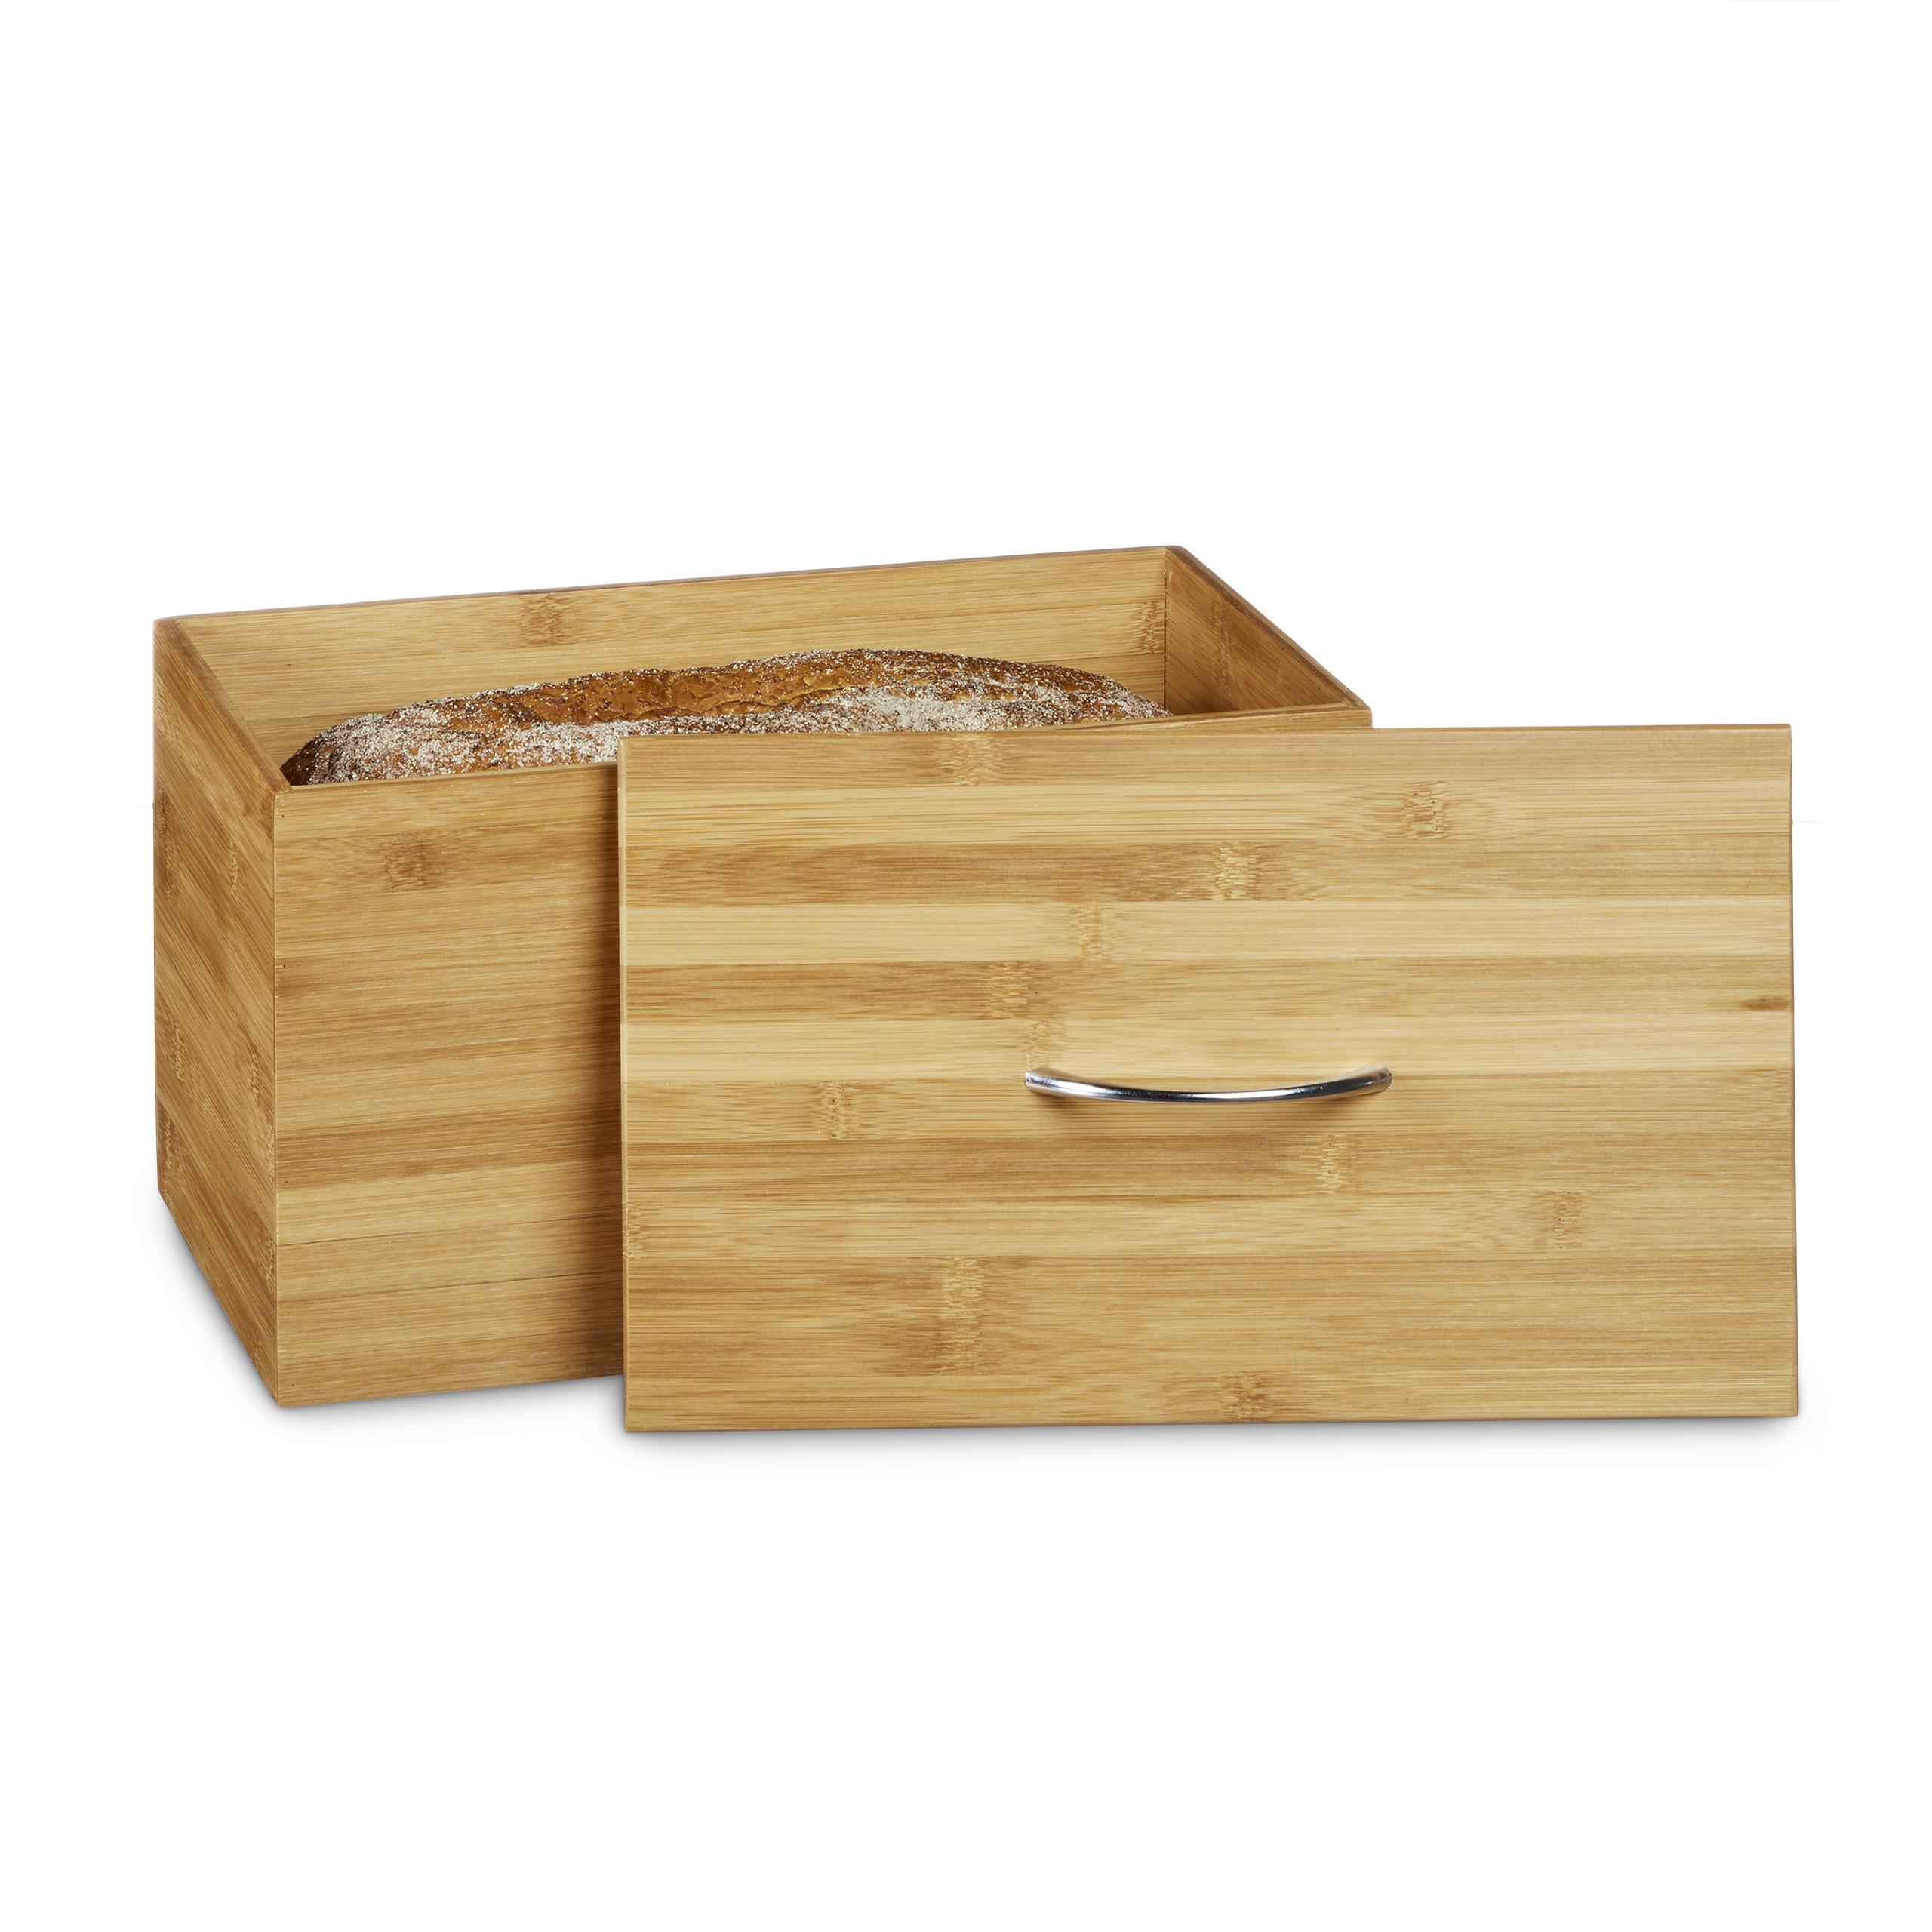 Brotkasten Bambus Brotbox Brotkiste Brot Kasten Brotdose Brotaufbewahrung Holz